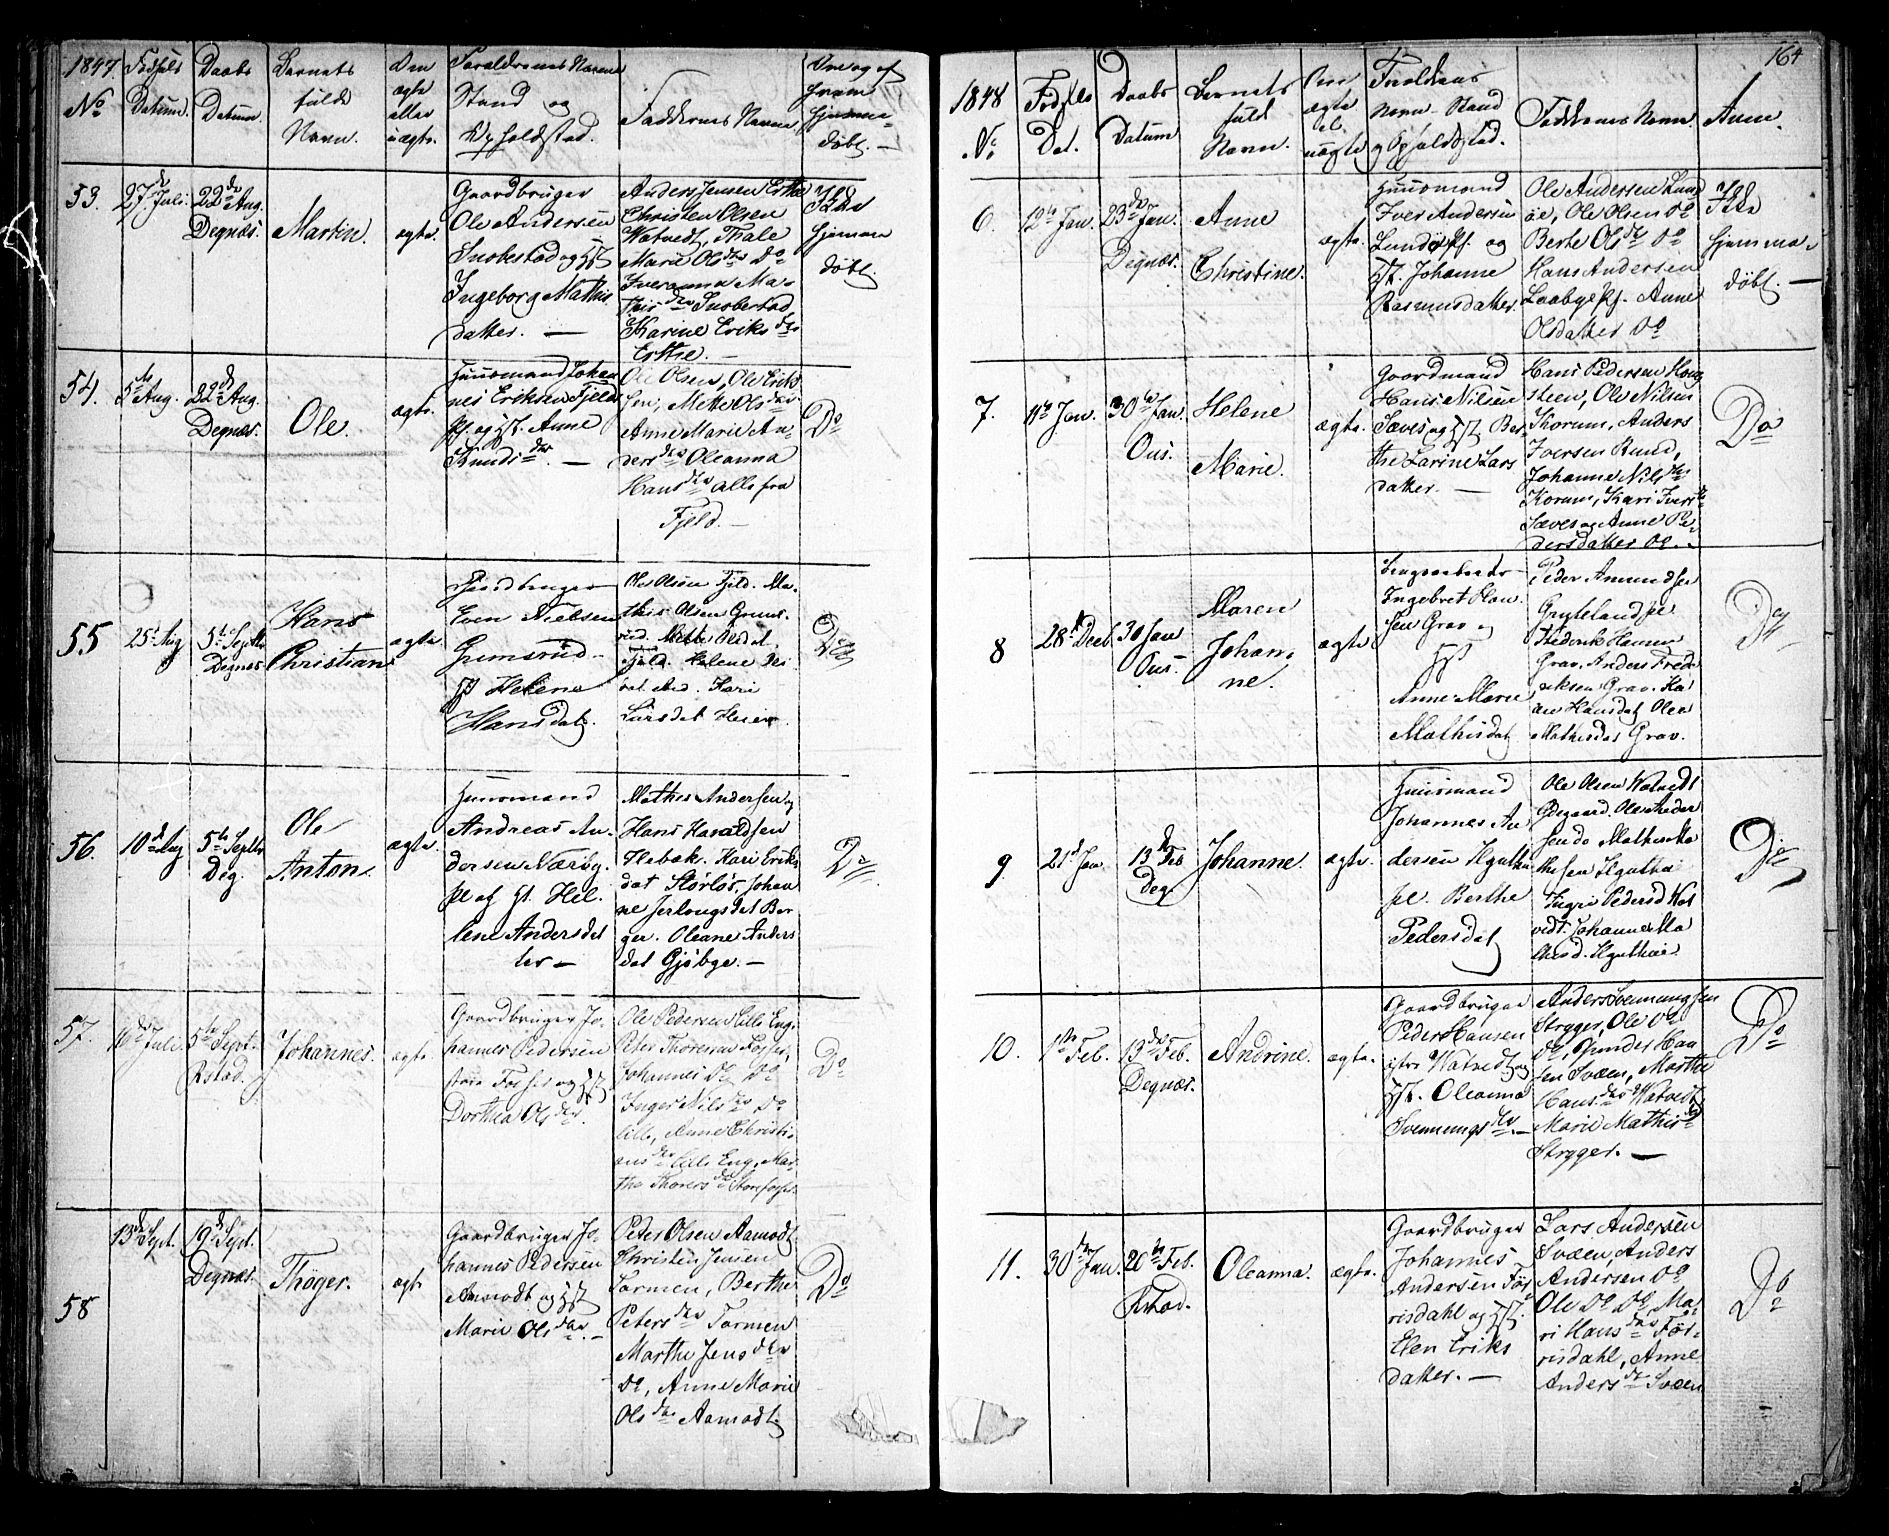 SAO, Rakkestad prestekontor Kirkebøker, F/Fa/L0008: Ministerialbok nr. I 8, 1842-1849, s. 163-164